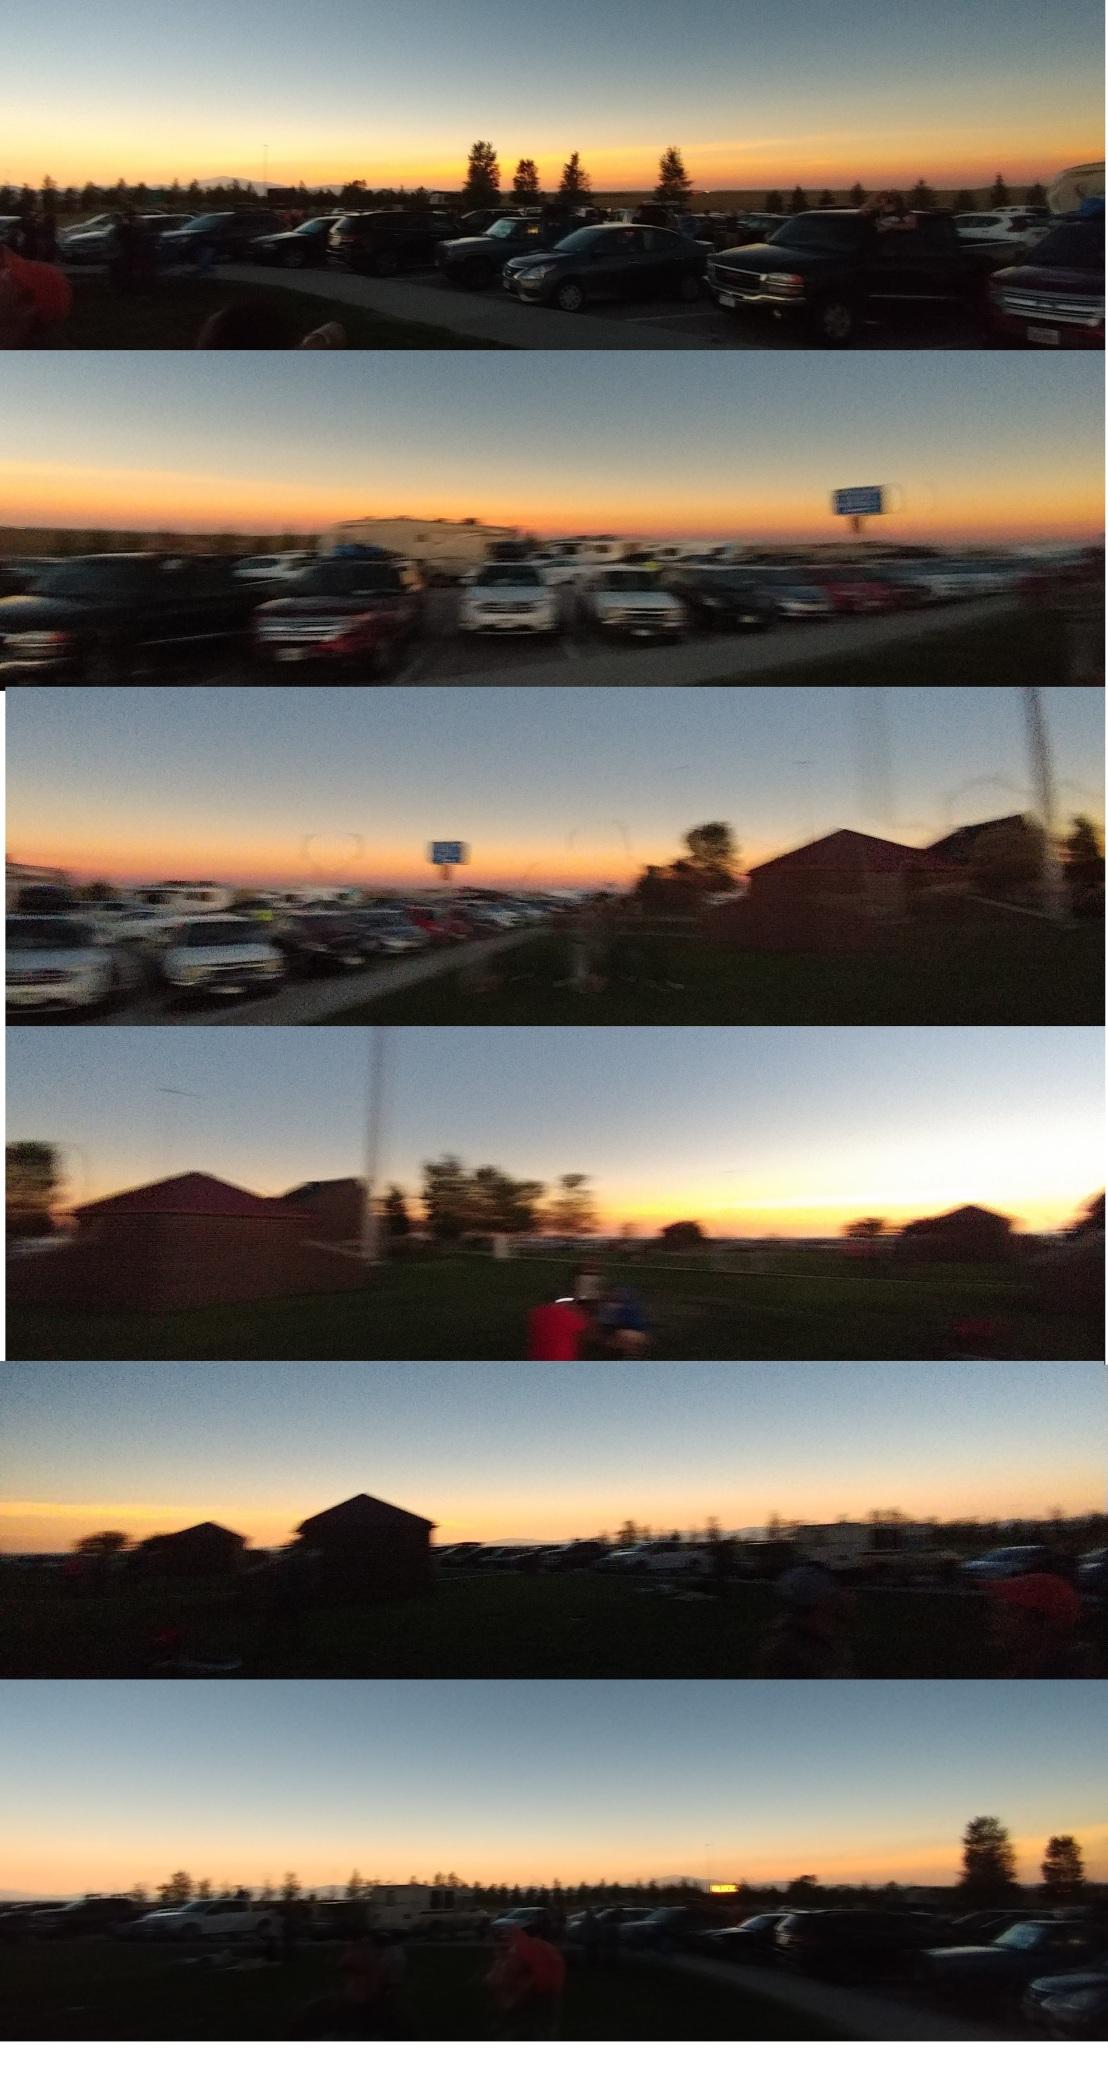 EclipseRedSkyMontageFull.jpg